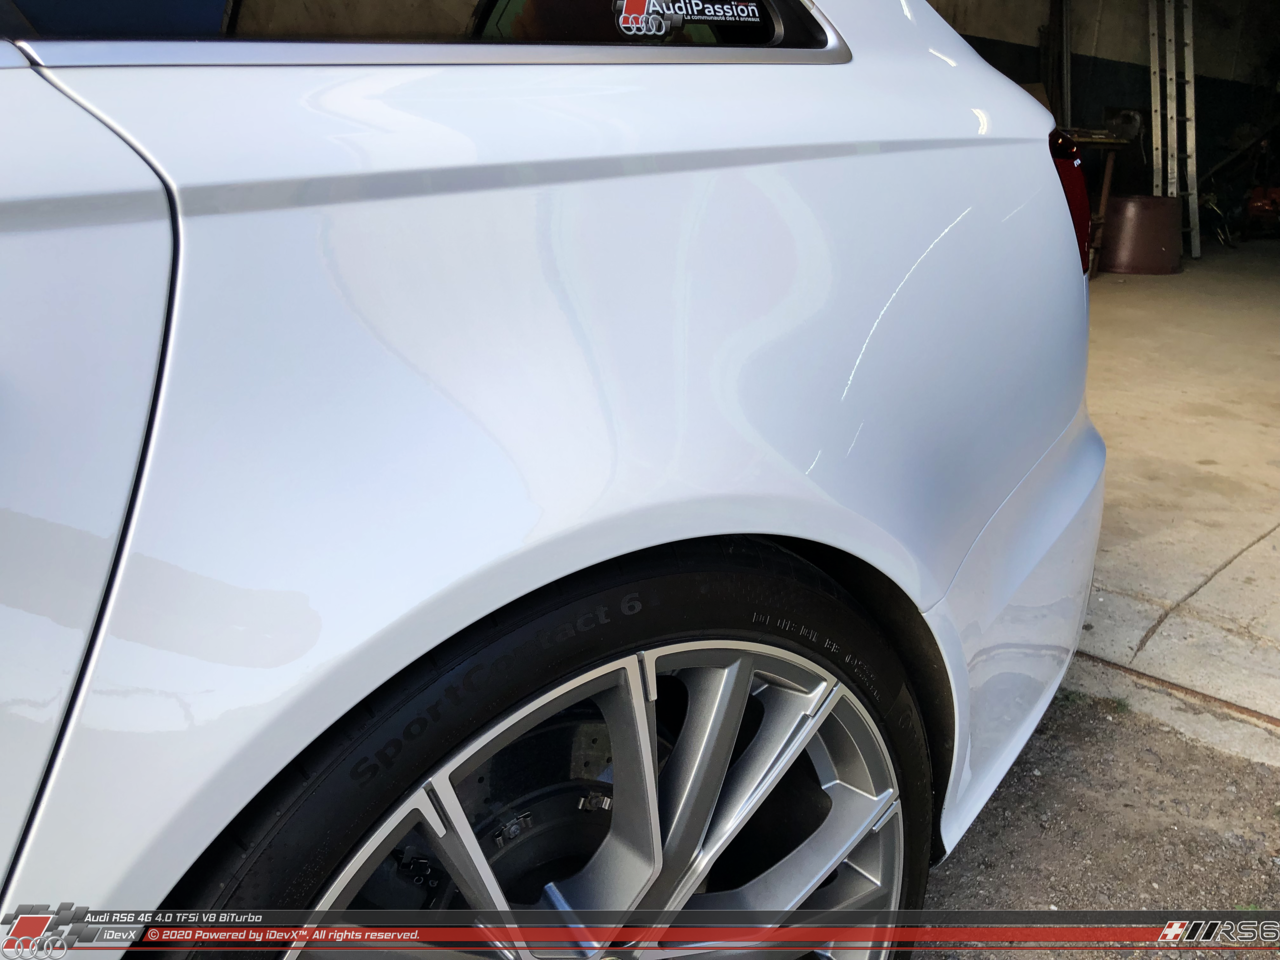 05_08.2019_Audi-RS6_iDevX_042.png